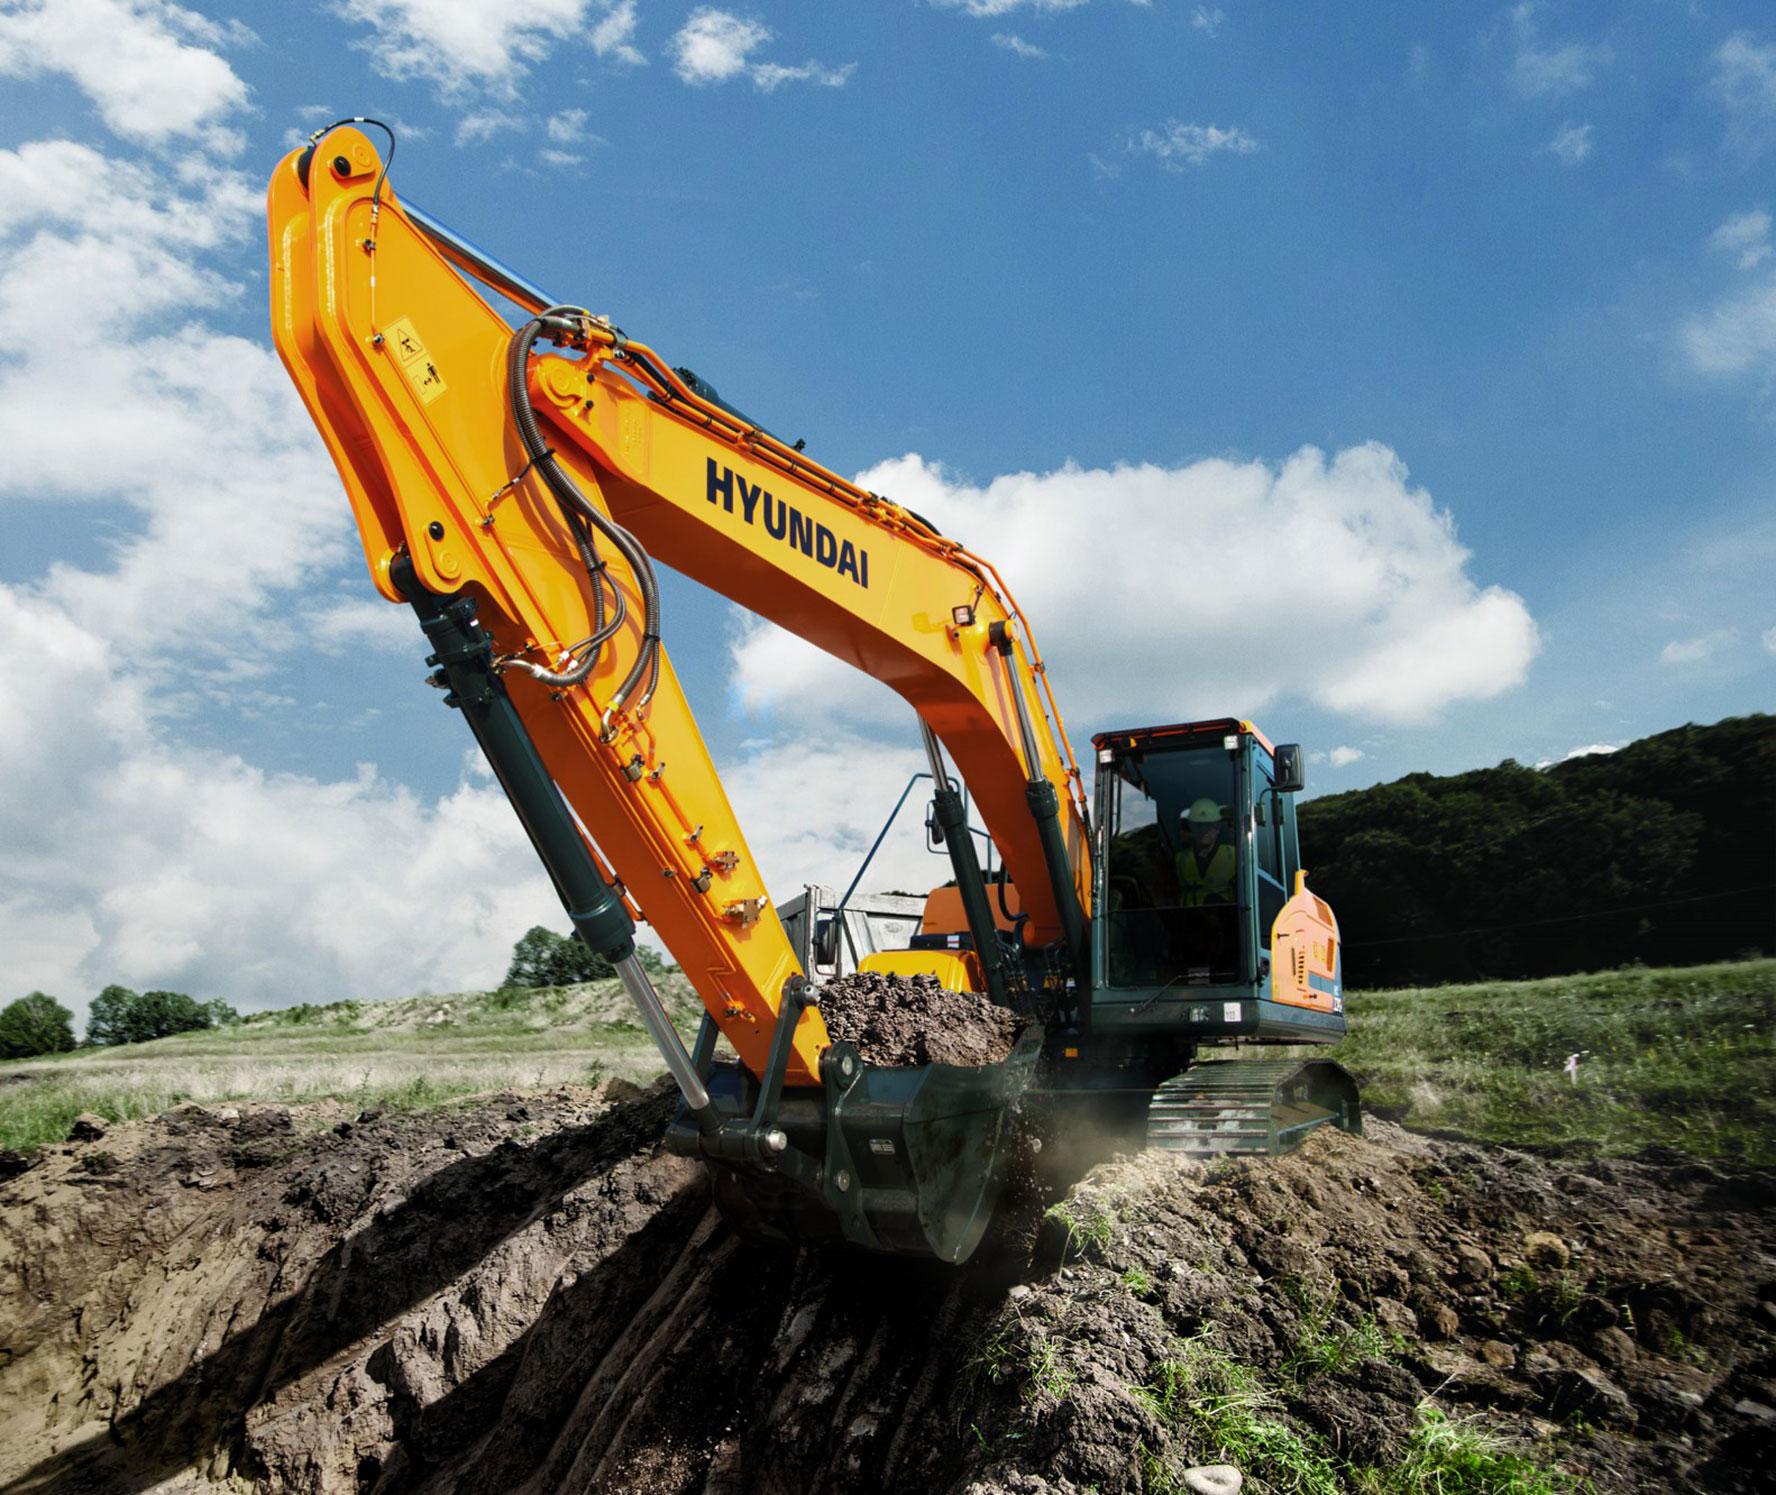 escavatore Hyundai serie HX 04285199-eb56-43a9-b264-6fe5219b7c84